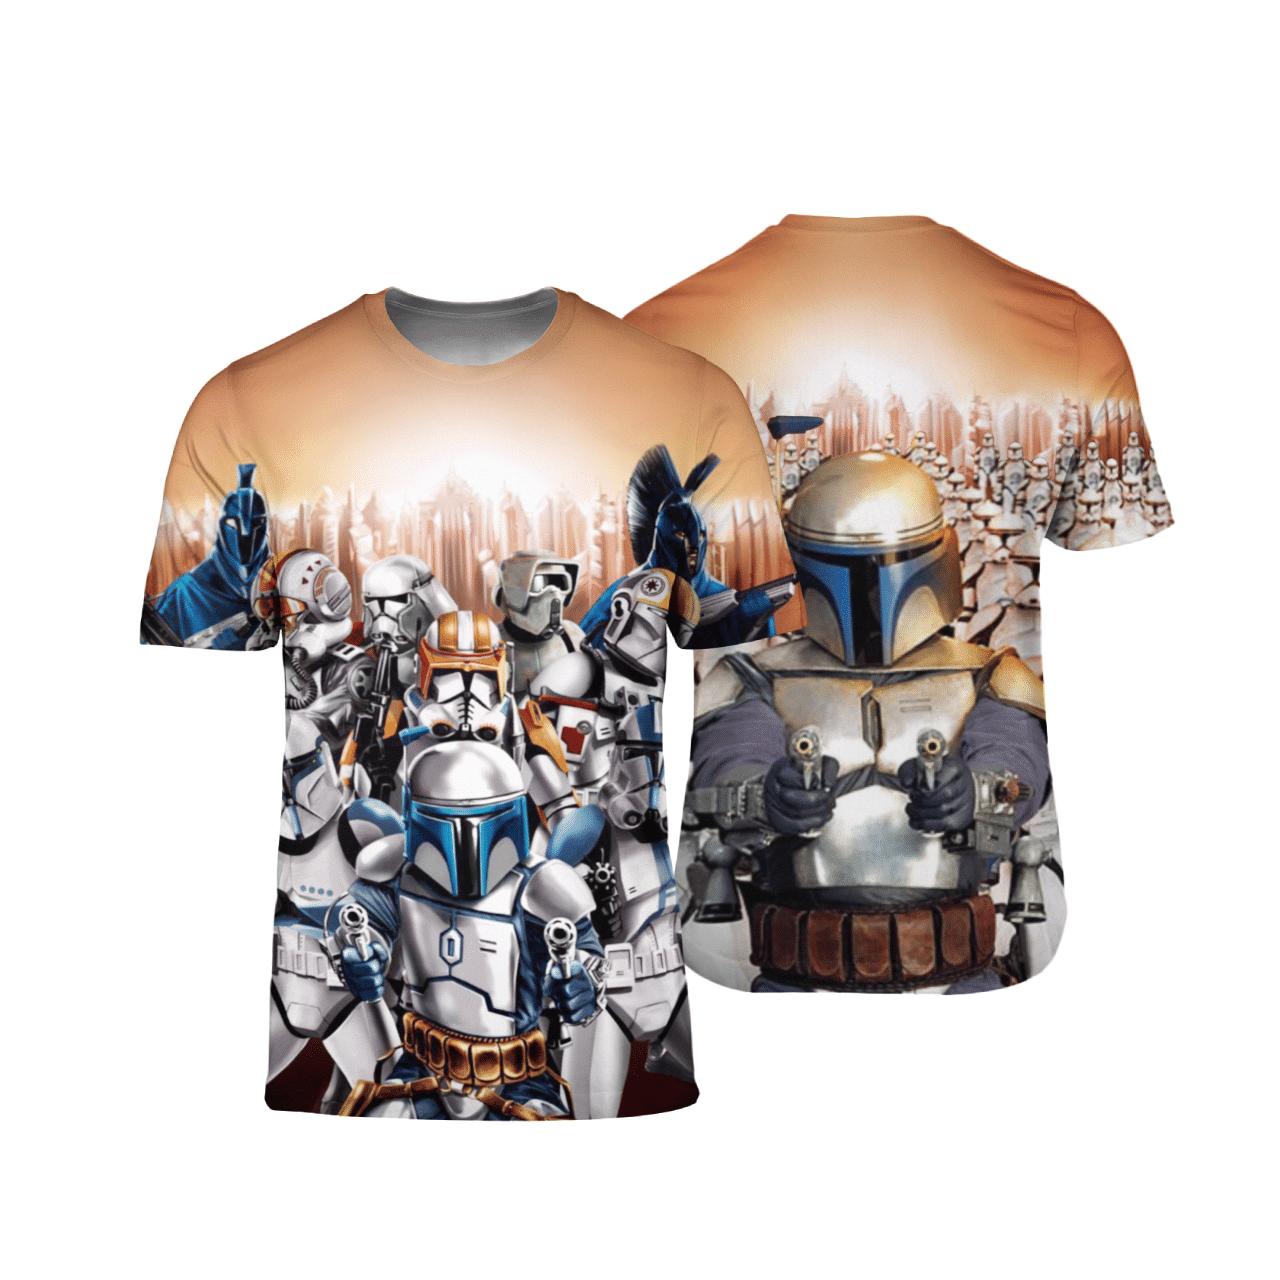 Stormtroopers Star Wars 3D T Shirt